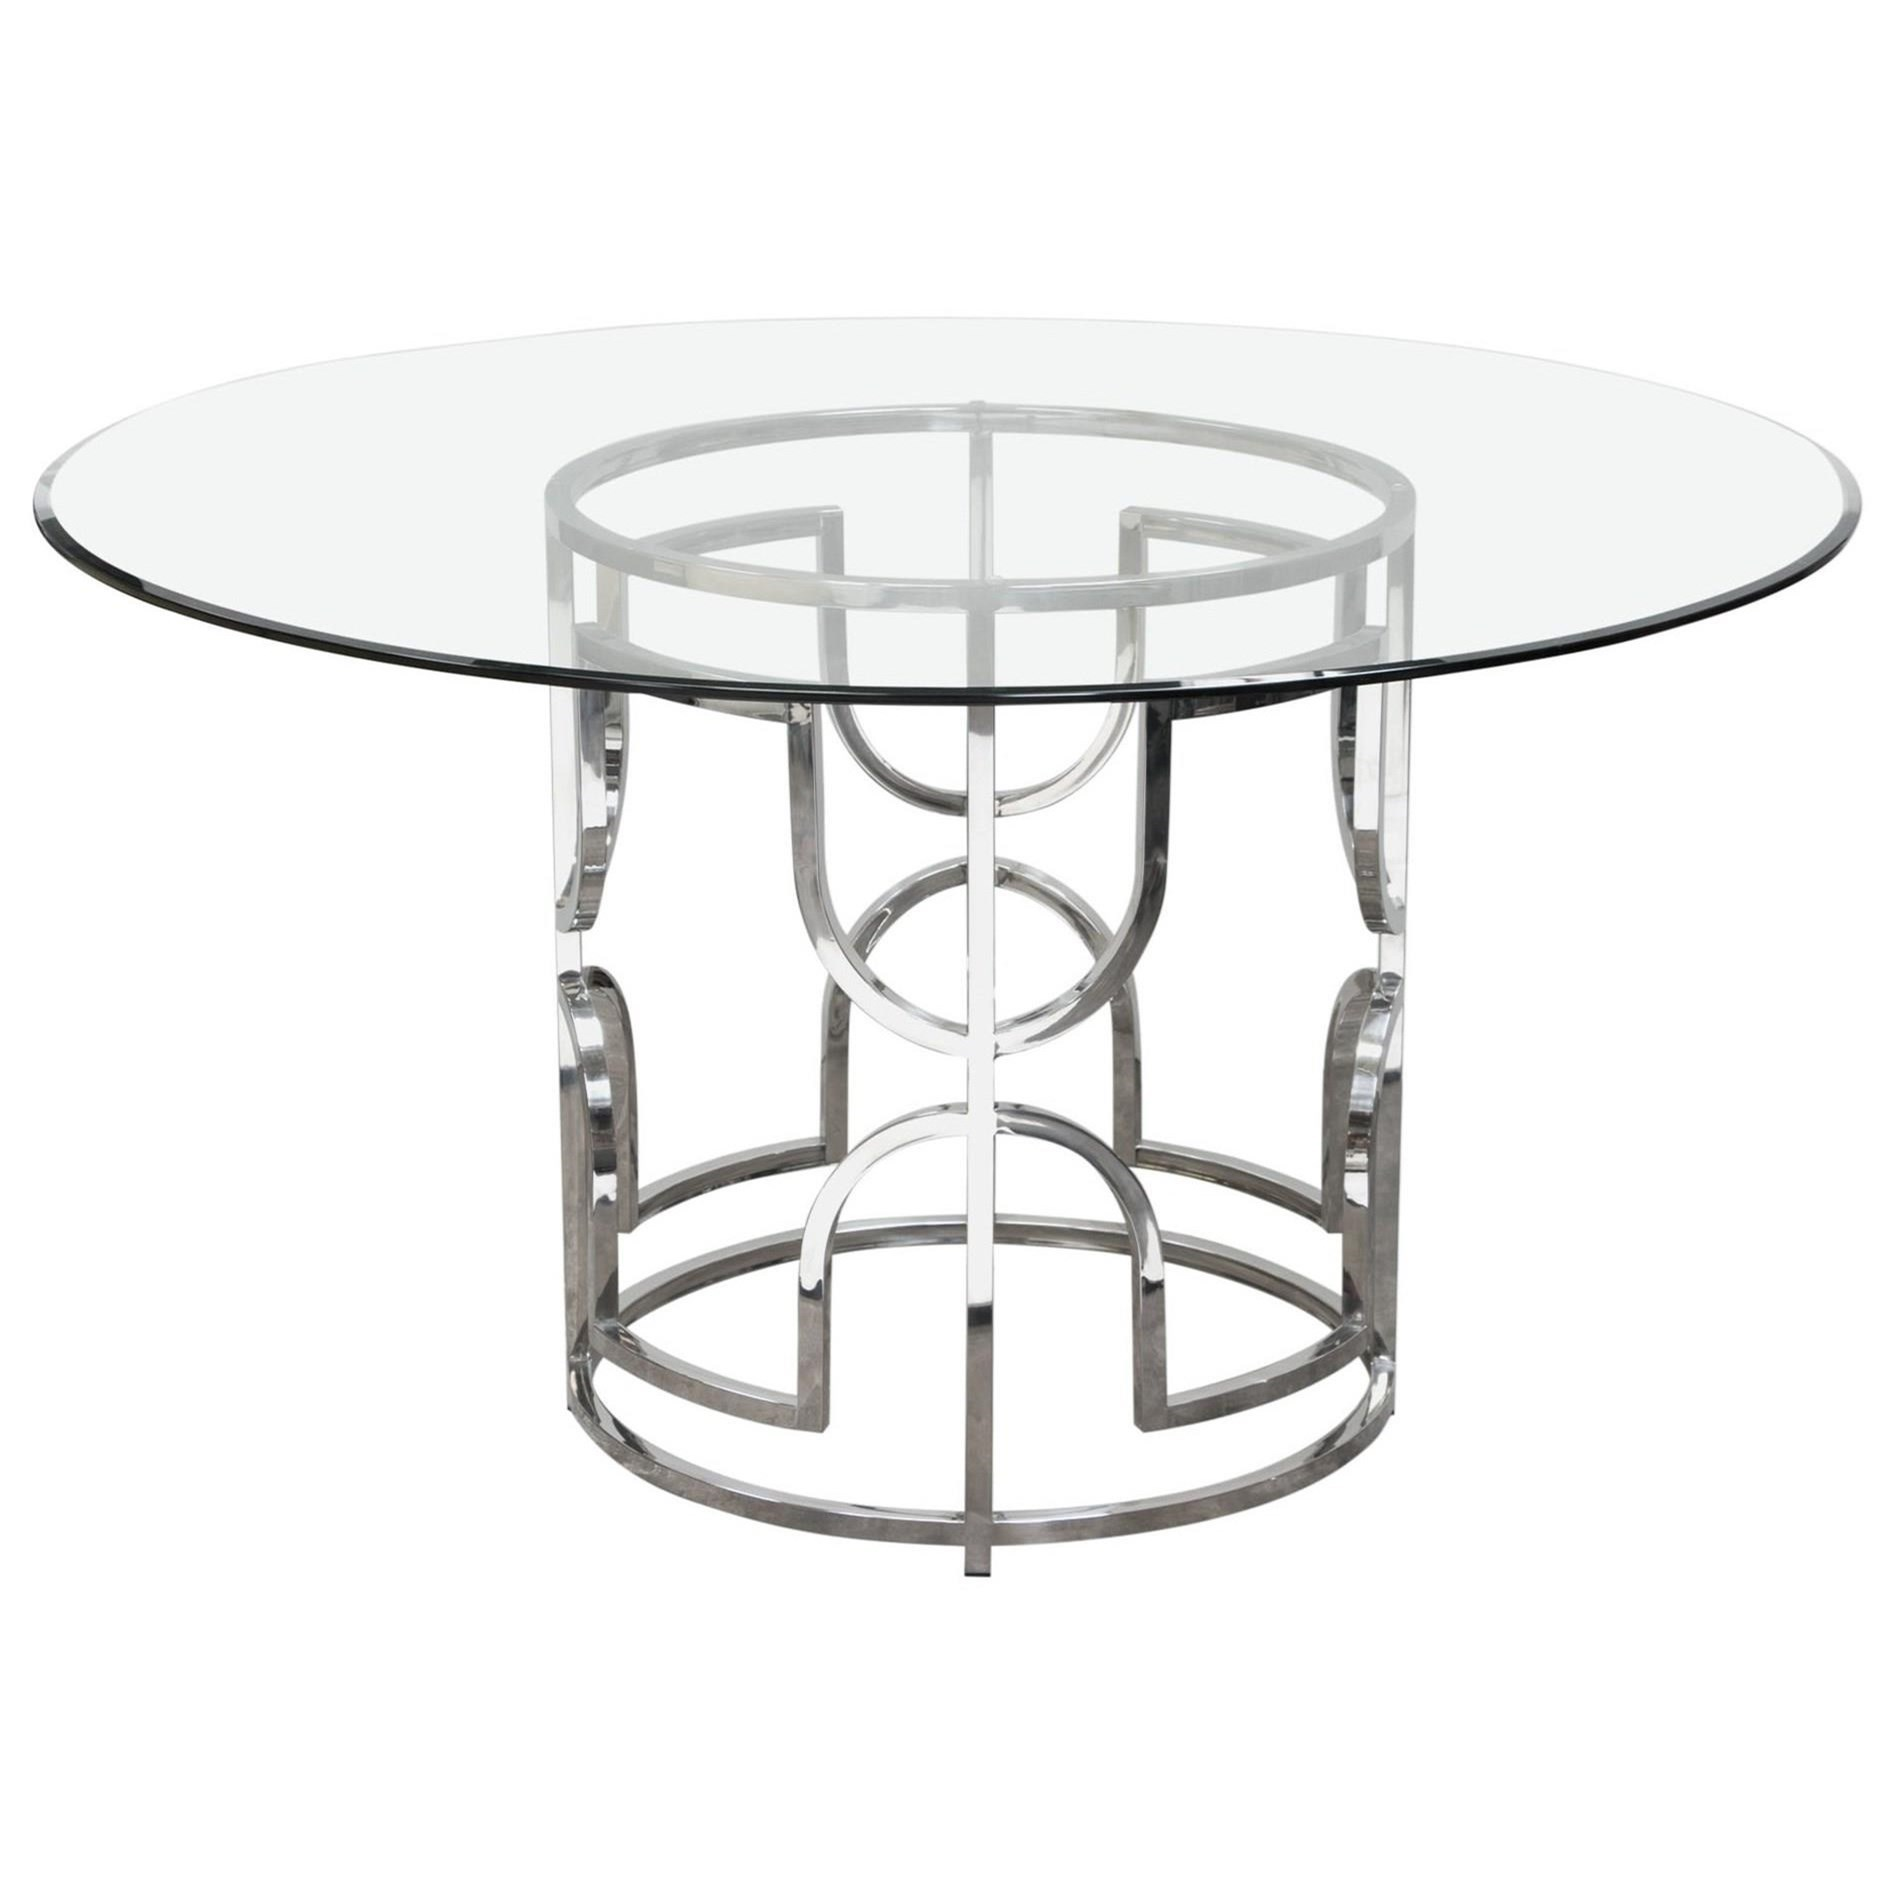 Diamond Sofa Avalon Avalonrdt 54 Round Glass Top Dining